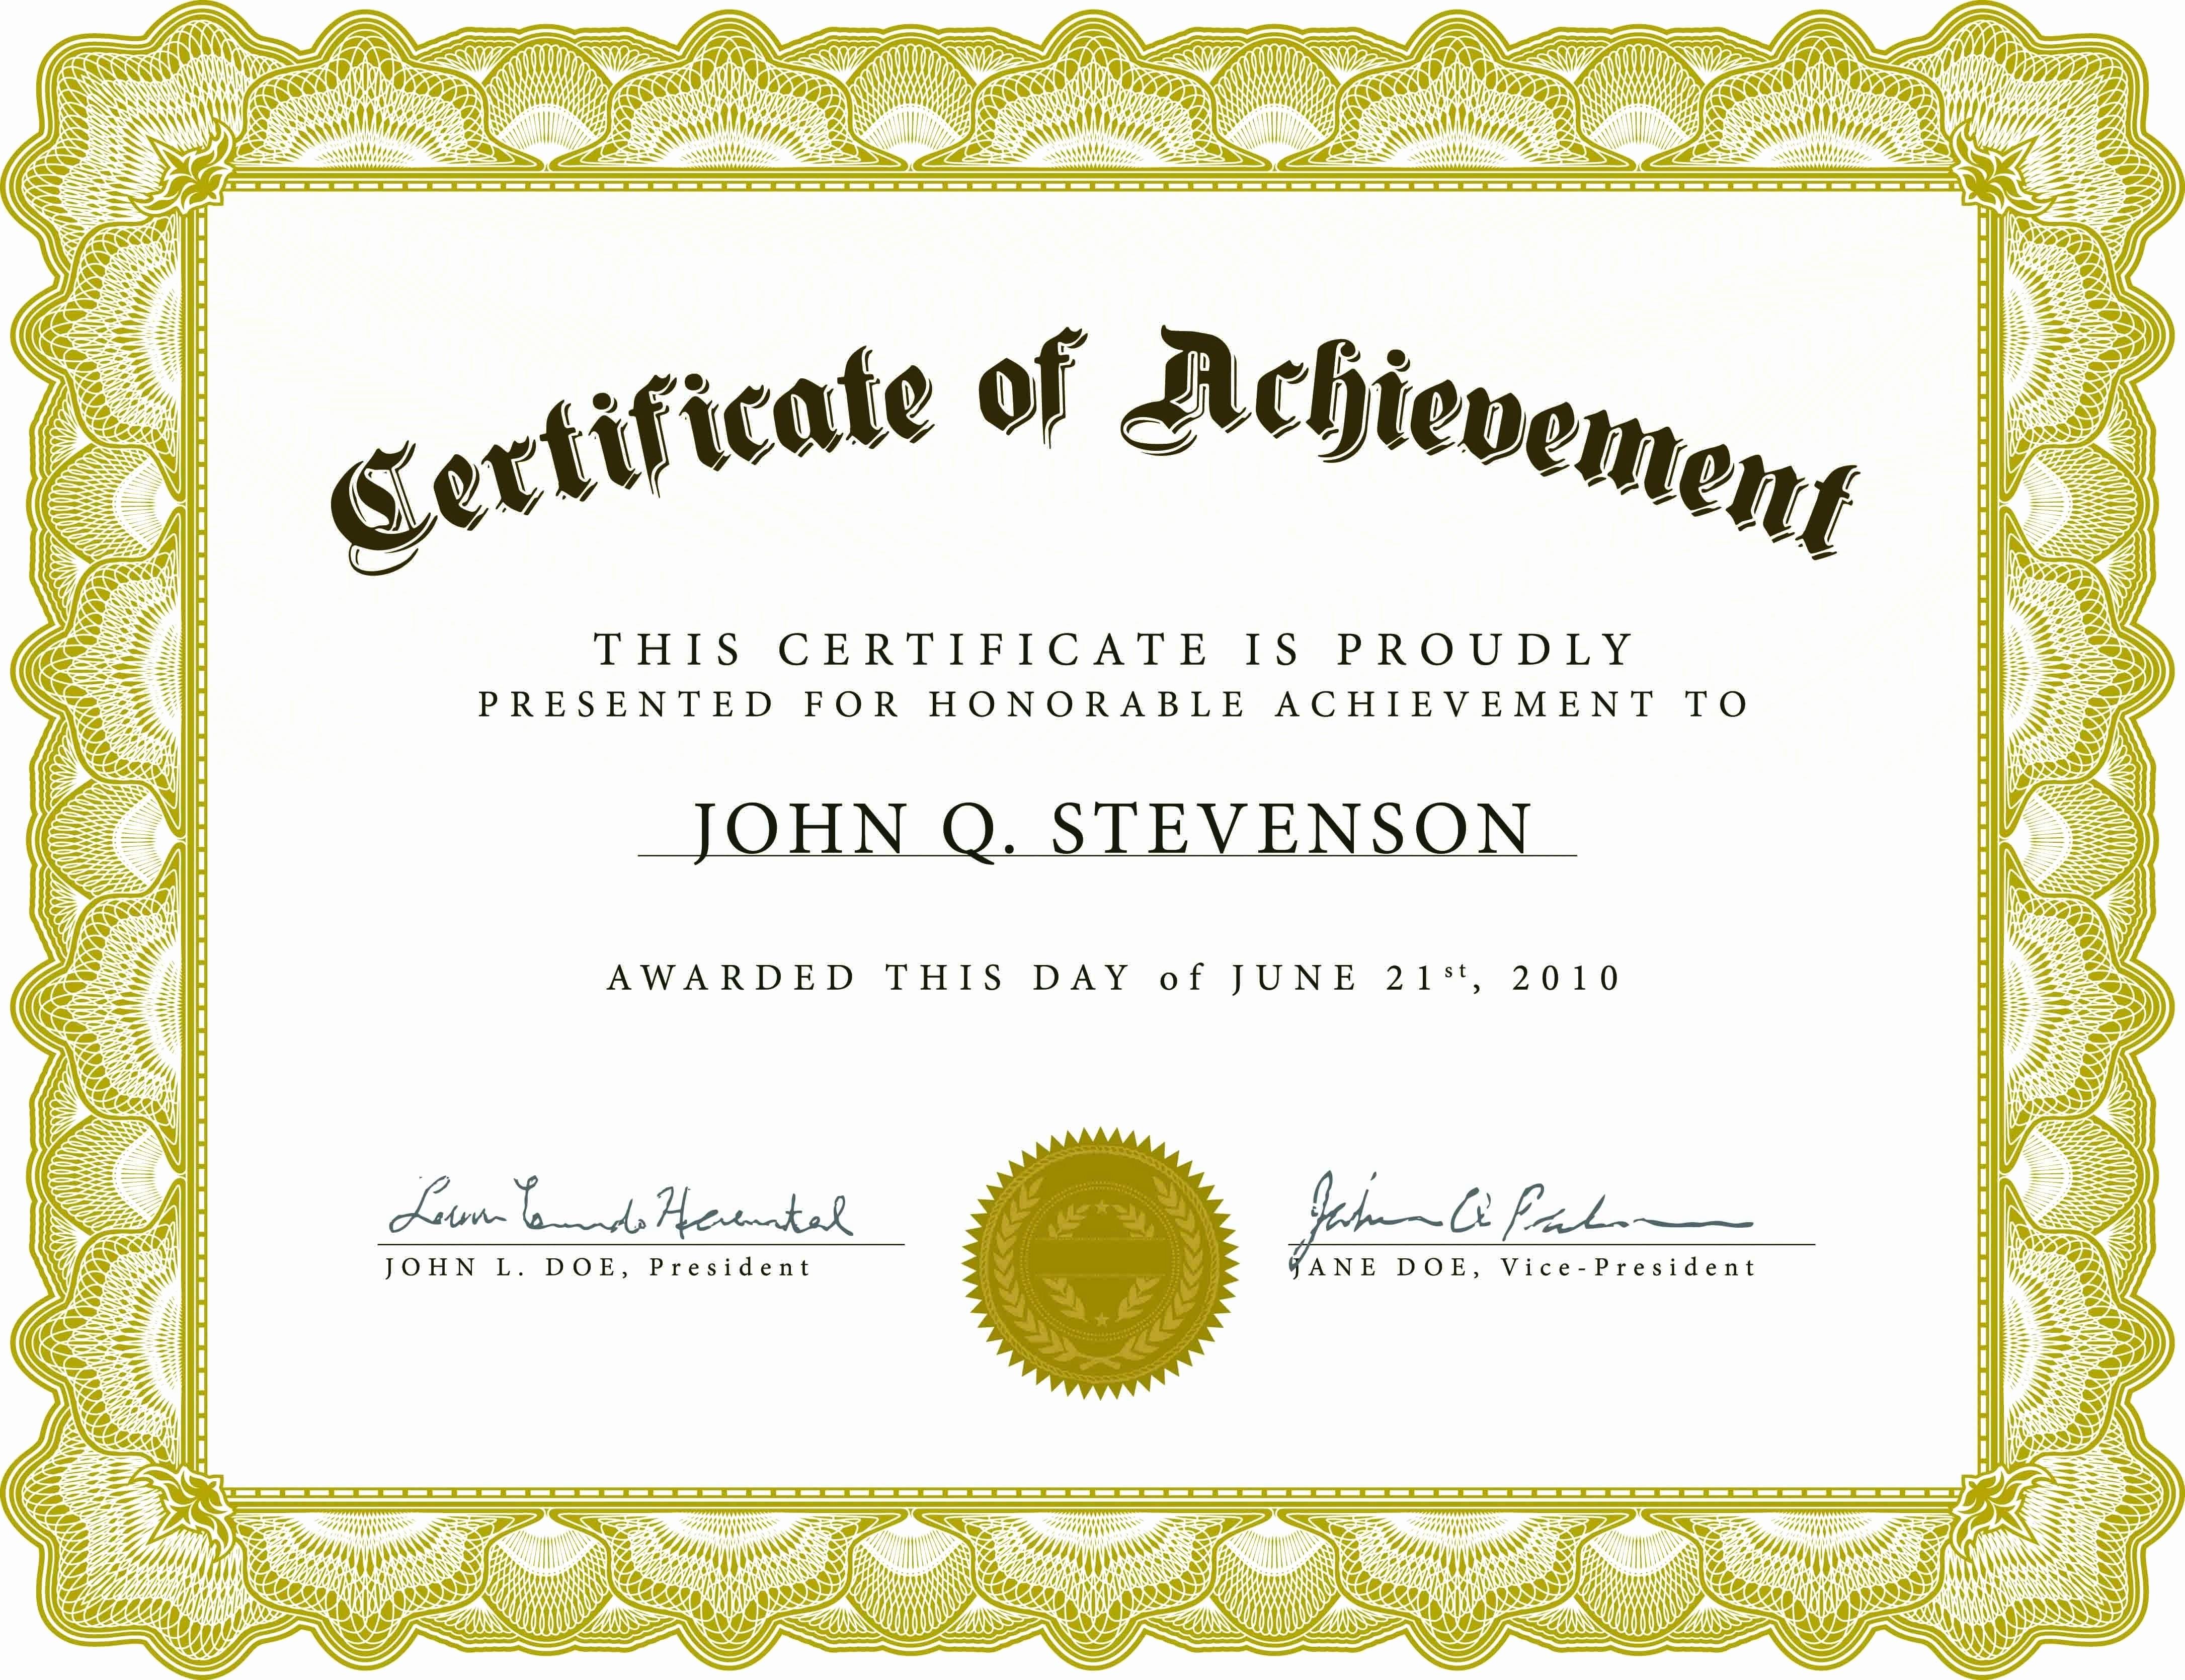 Microsoft Publisher Award Certificate Templates Best Of Award Certificate Template Publisher for Award Certificate